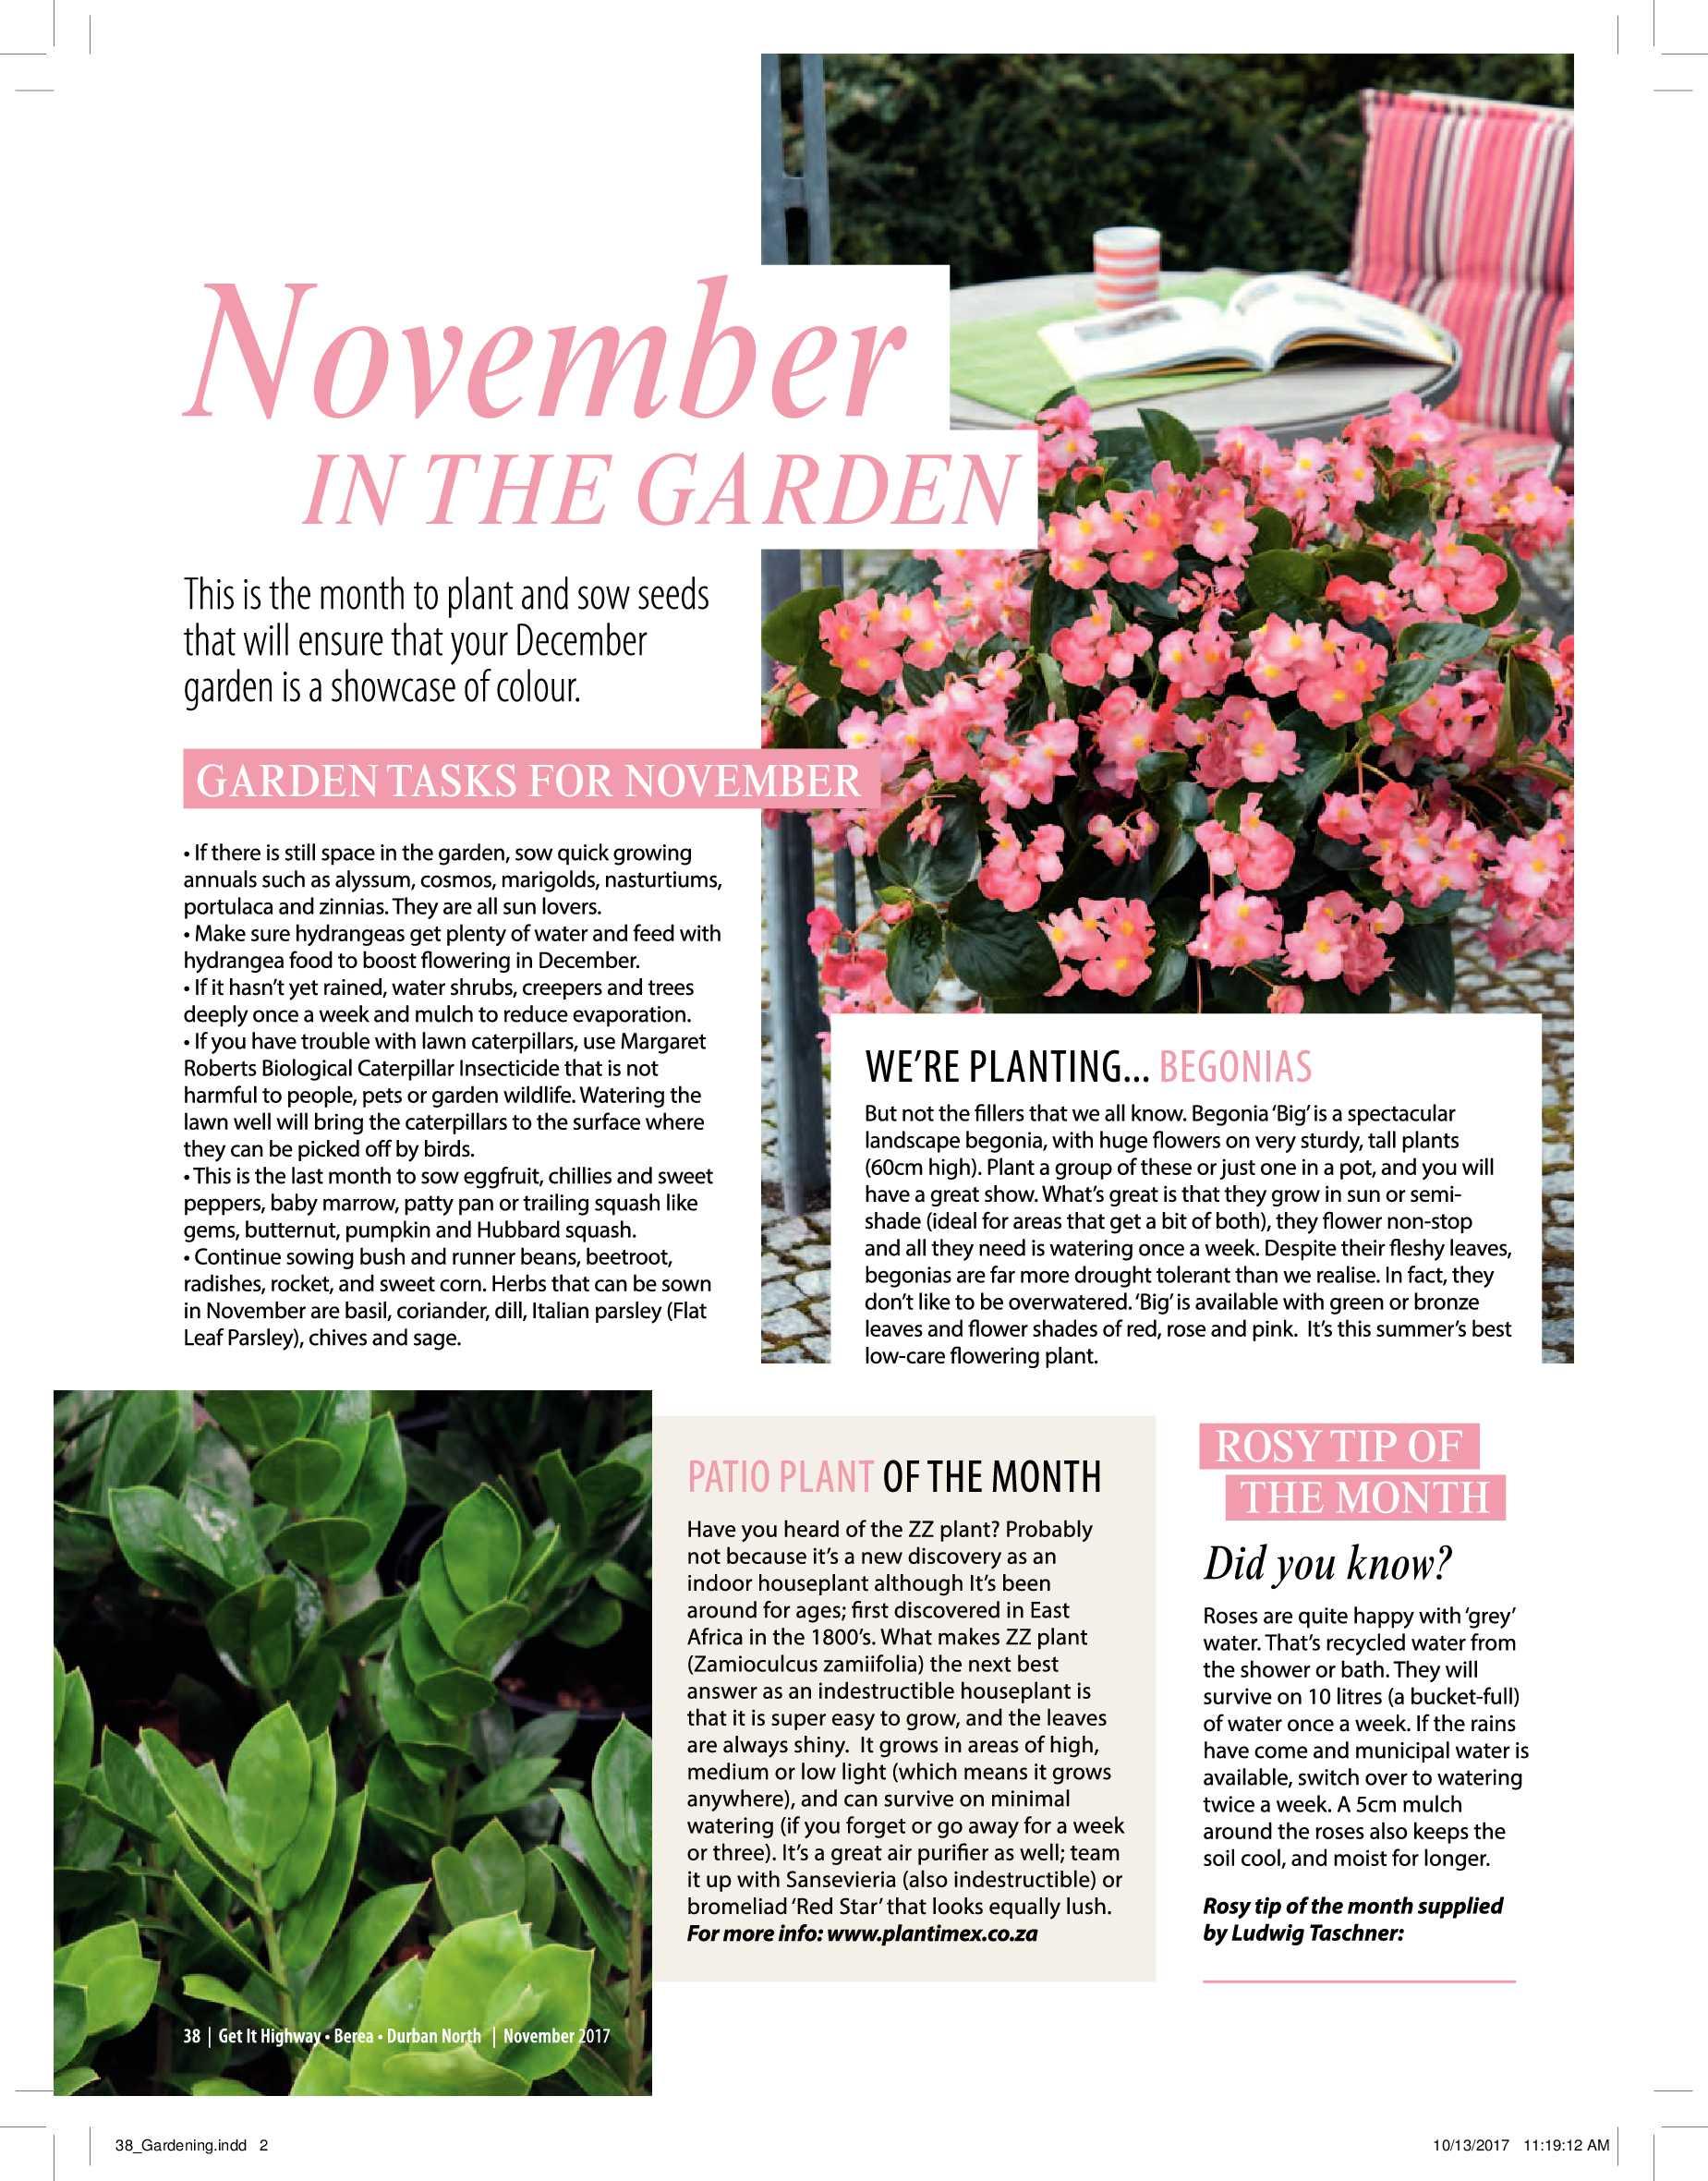 get-magazine-durban-november-2017-epapers-page-40